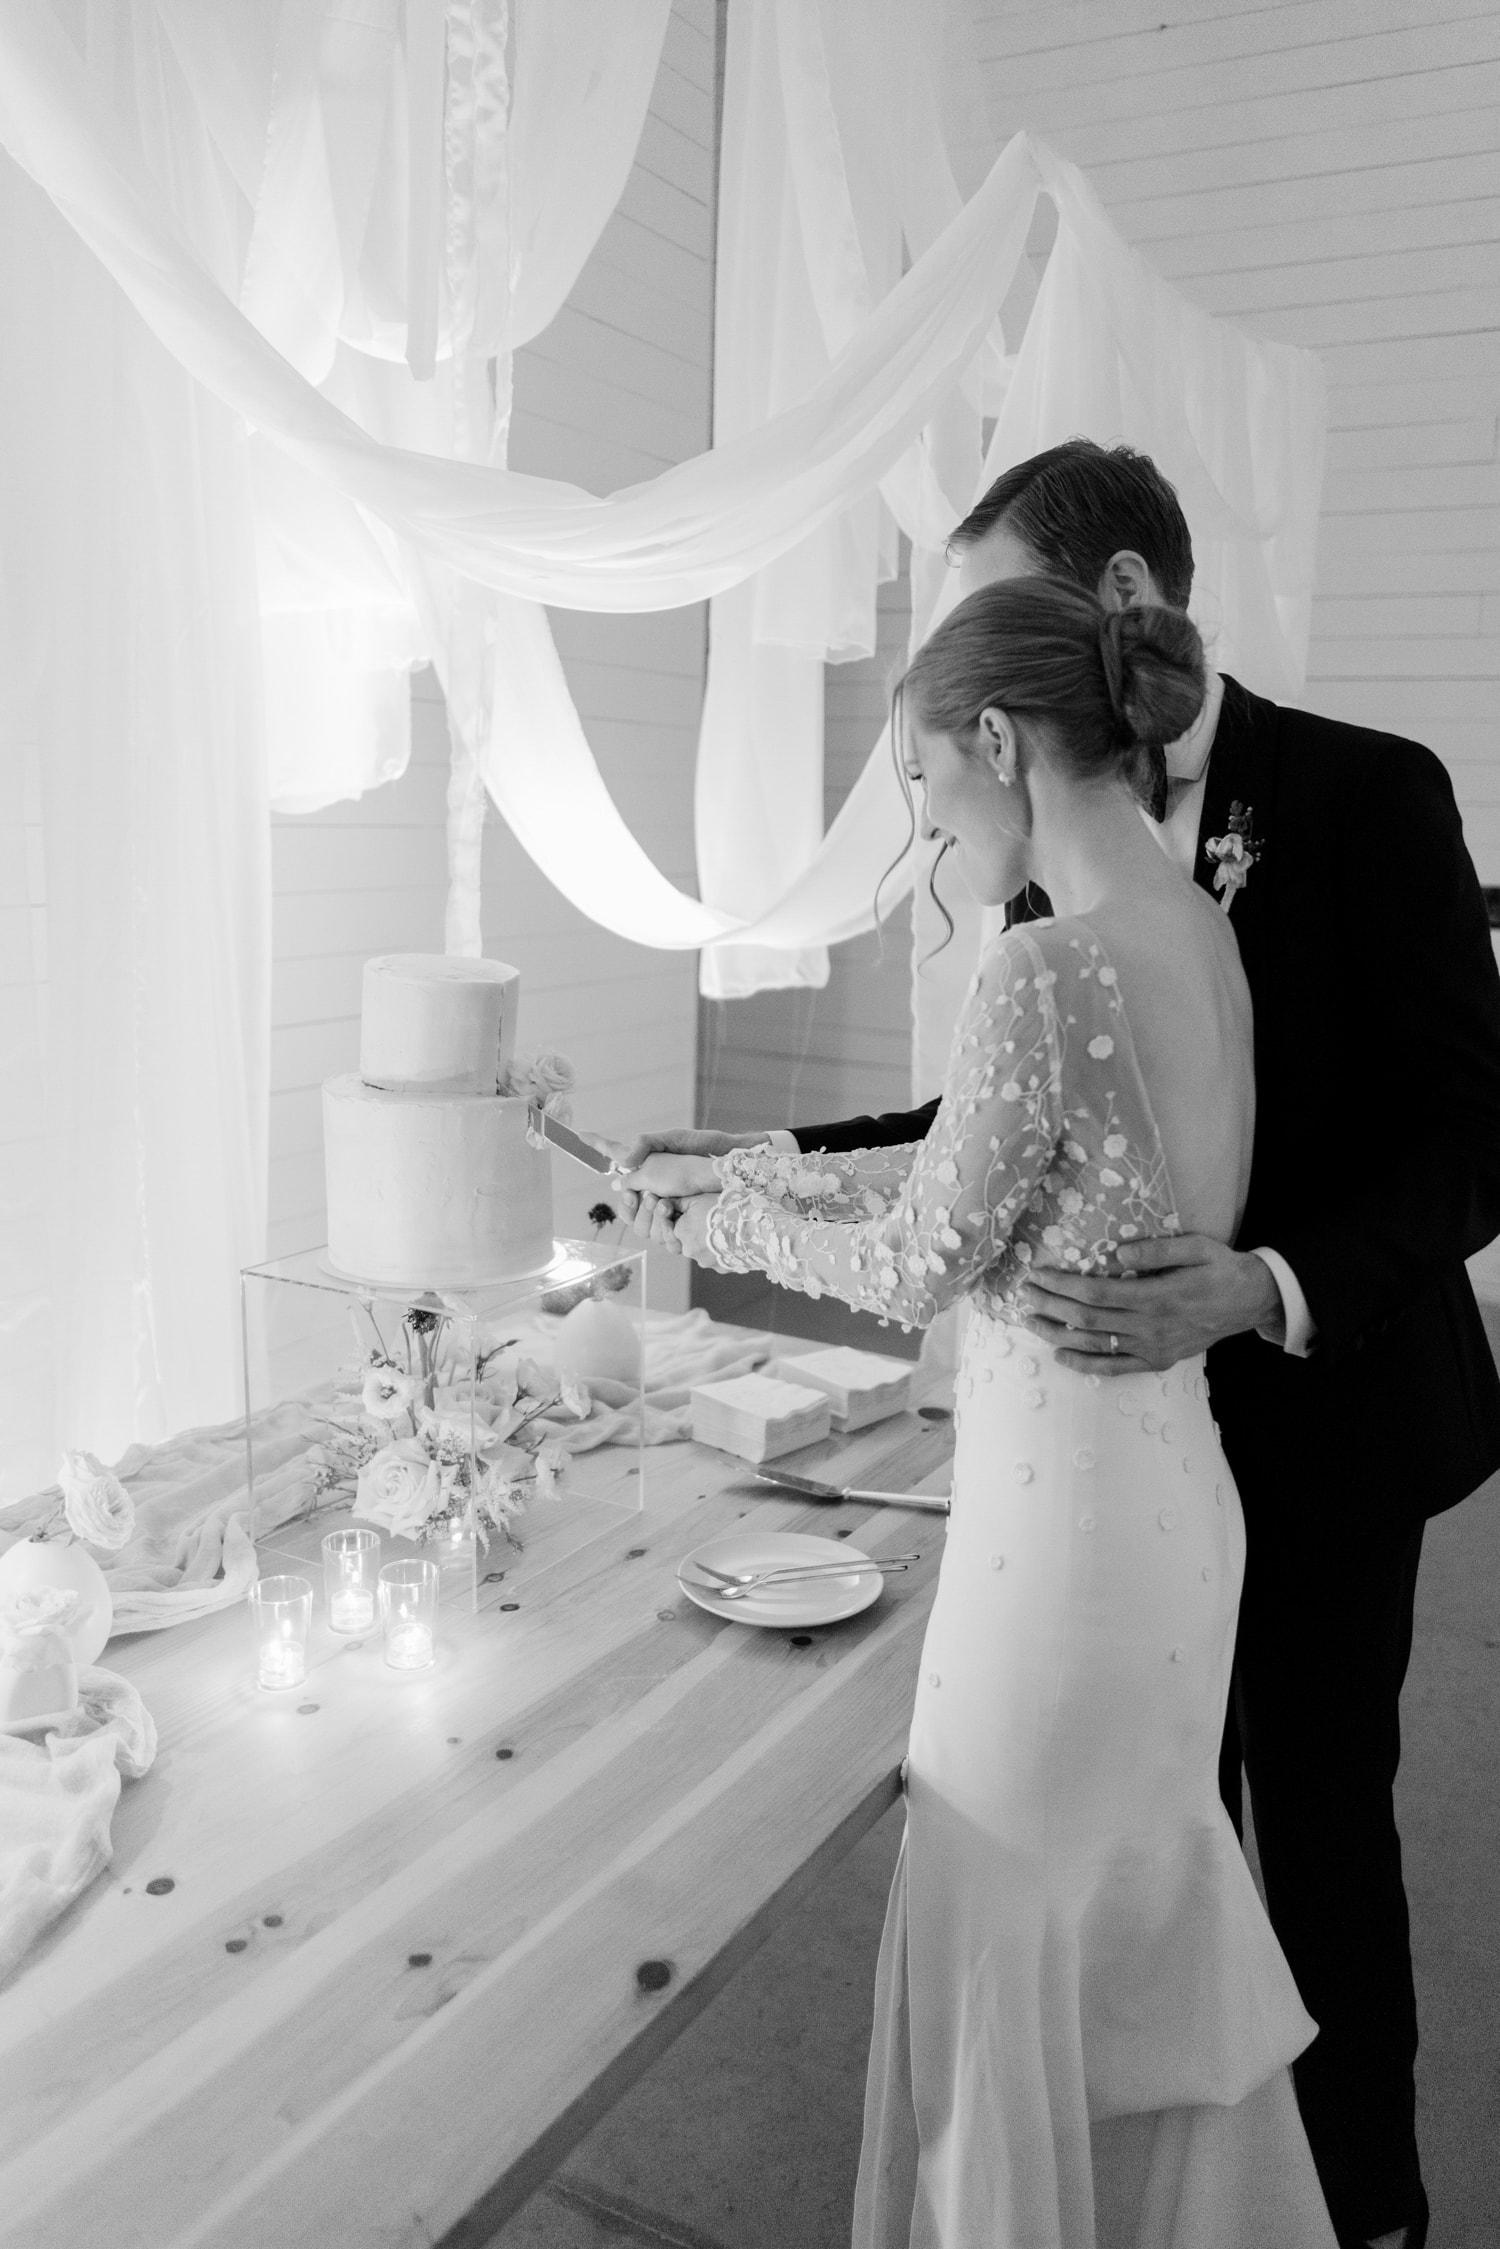 prospect-house-wedding-61.jpg